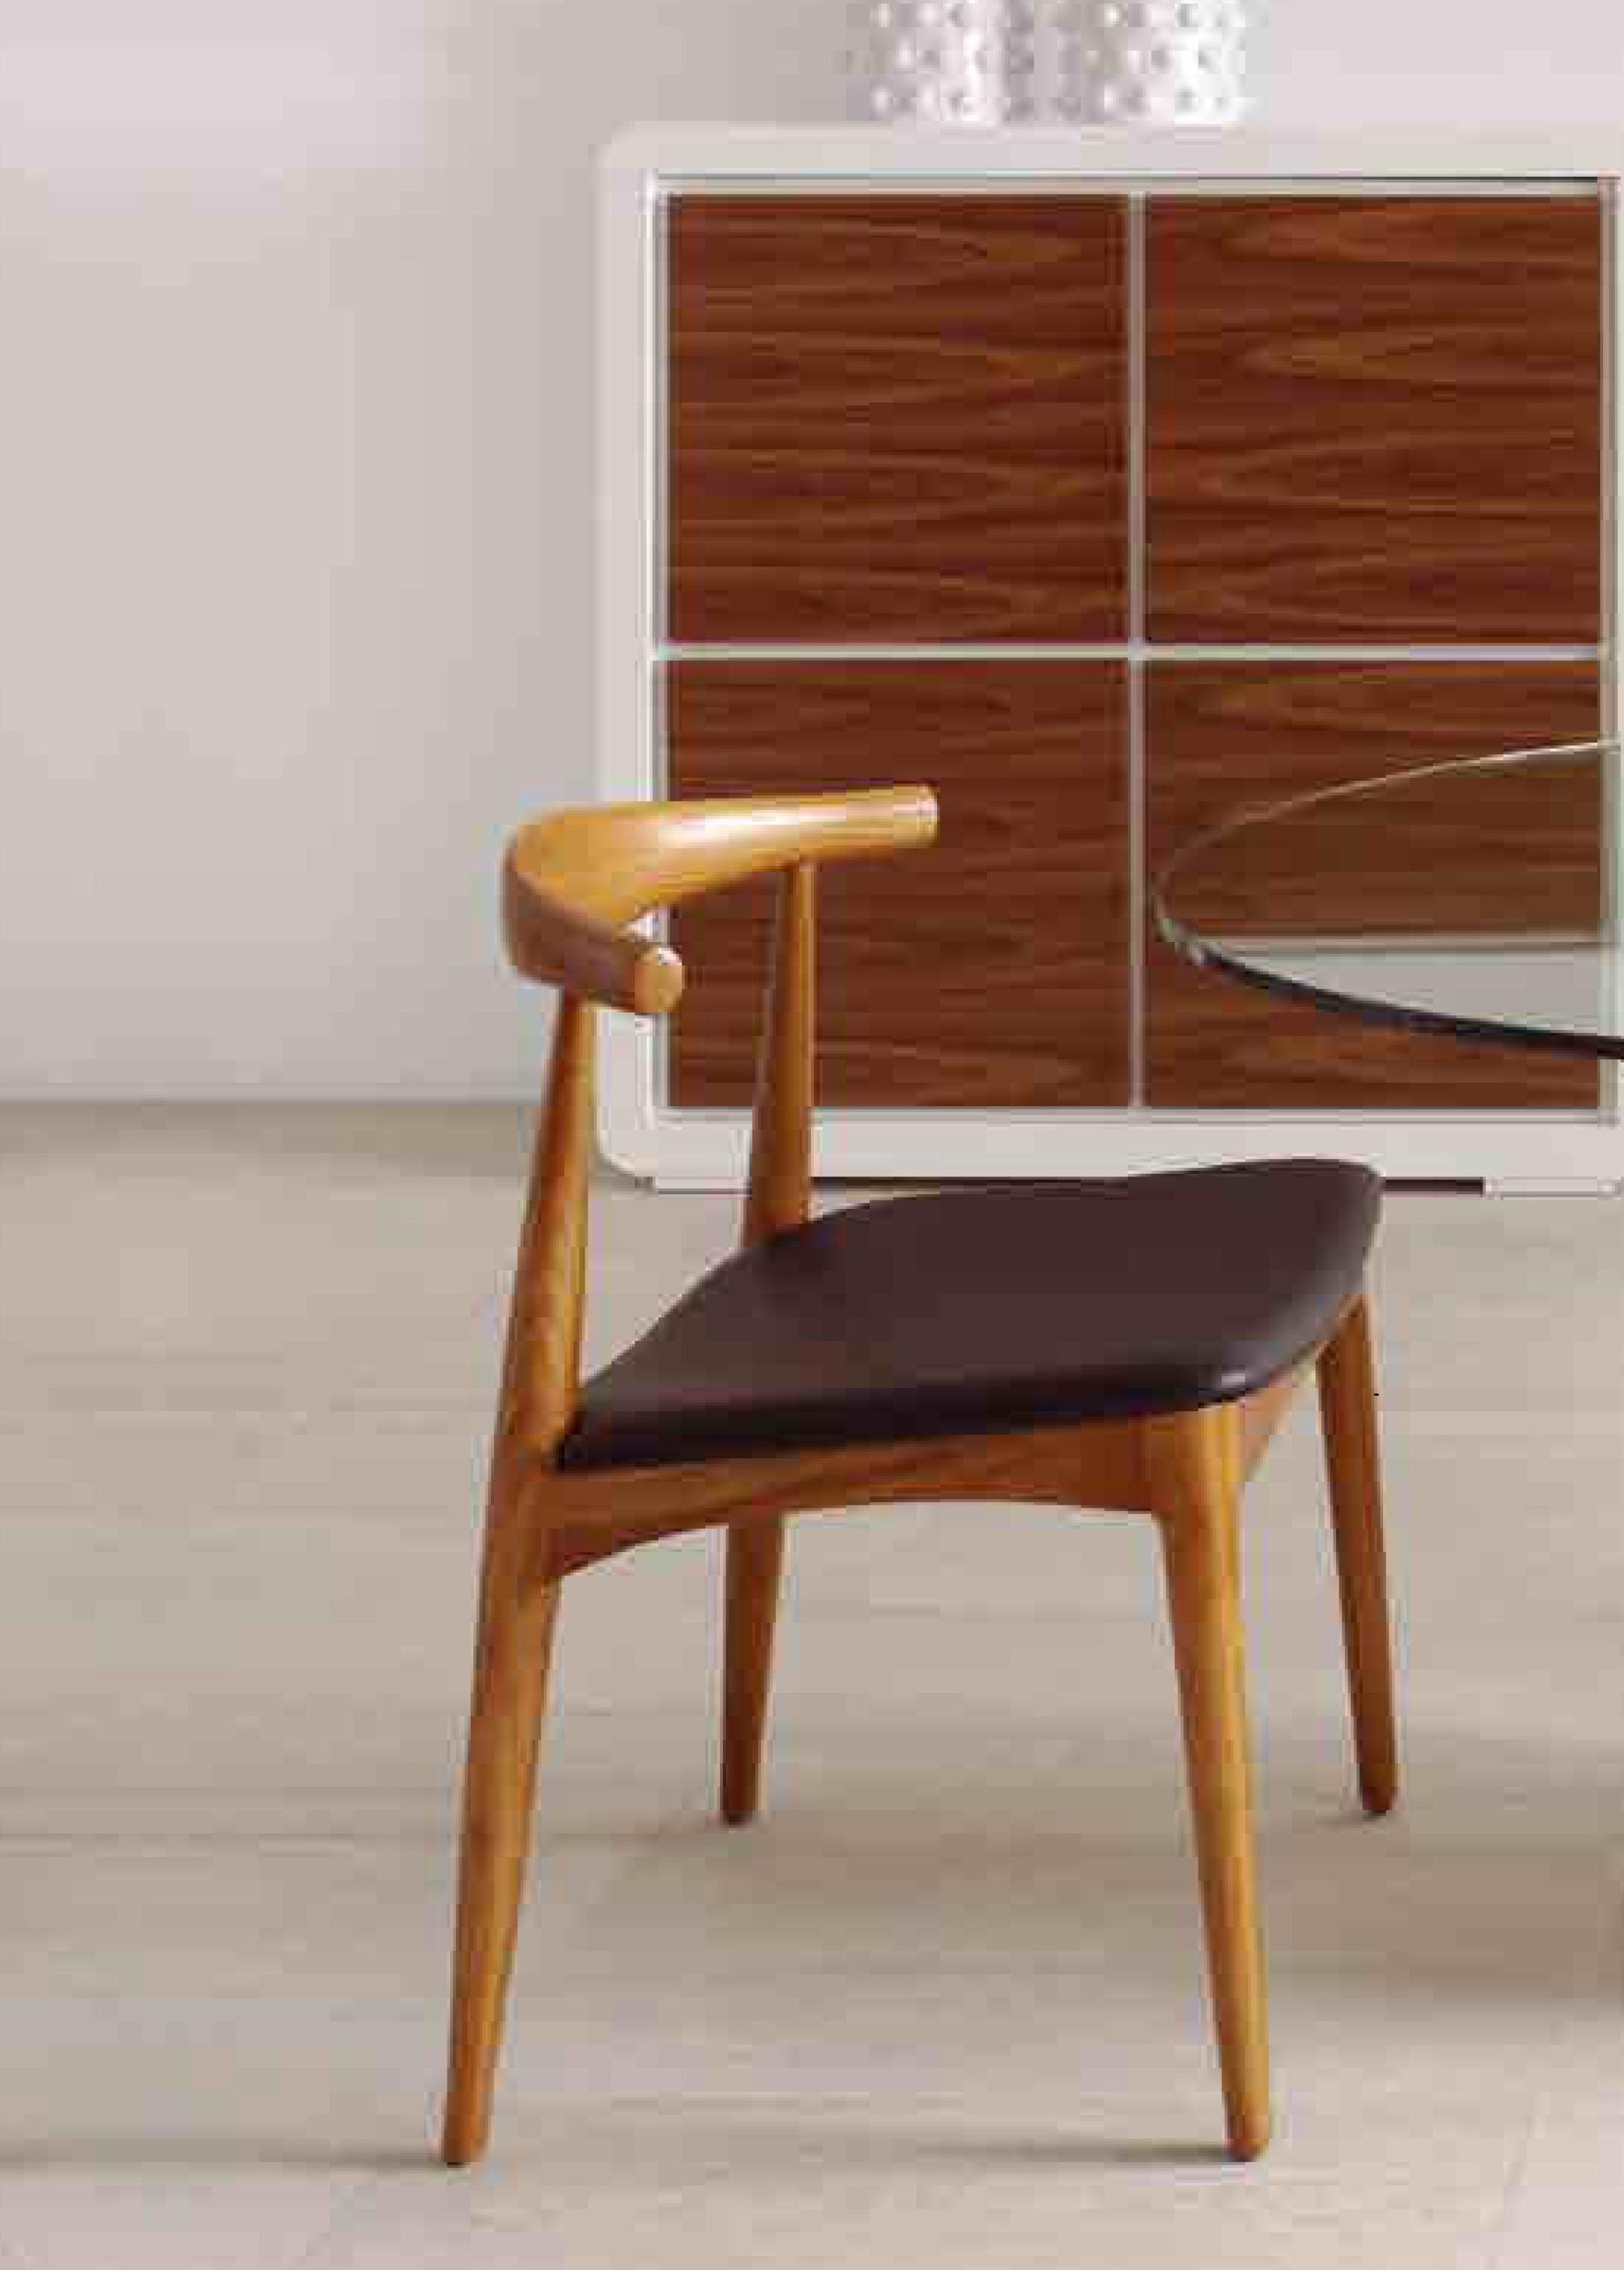 Silla moderna dise o madera muebles valencia for Sillas diseno valencia